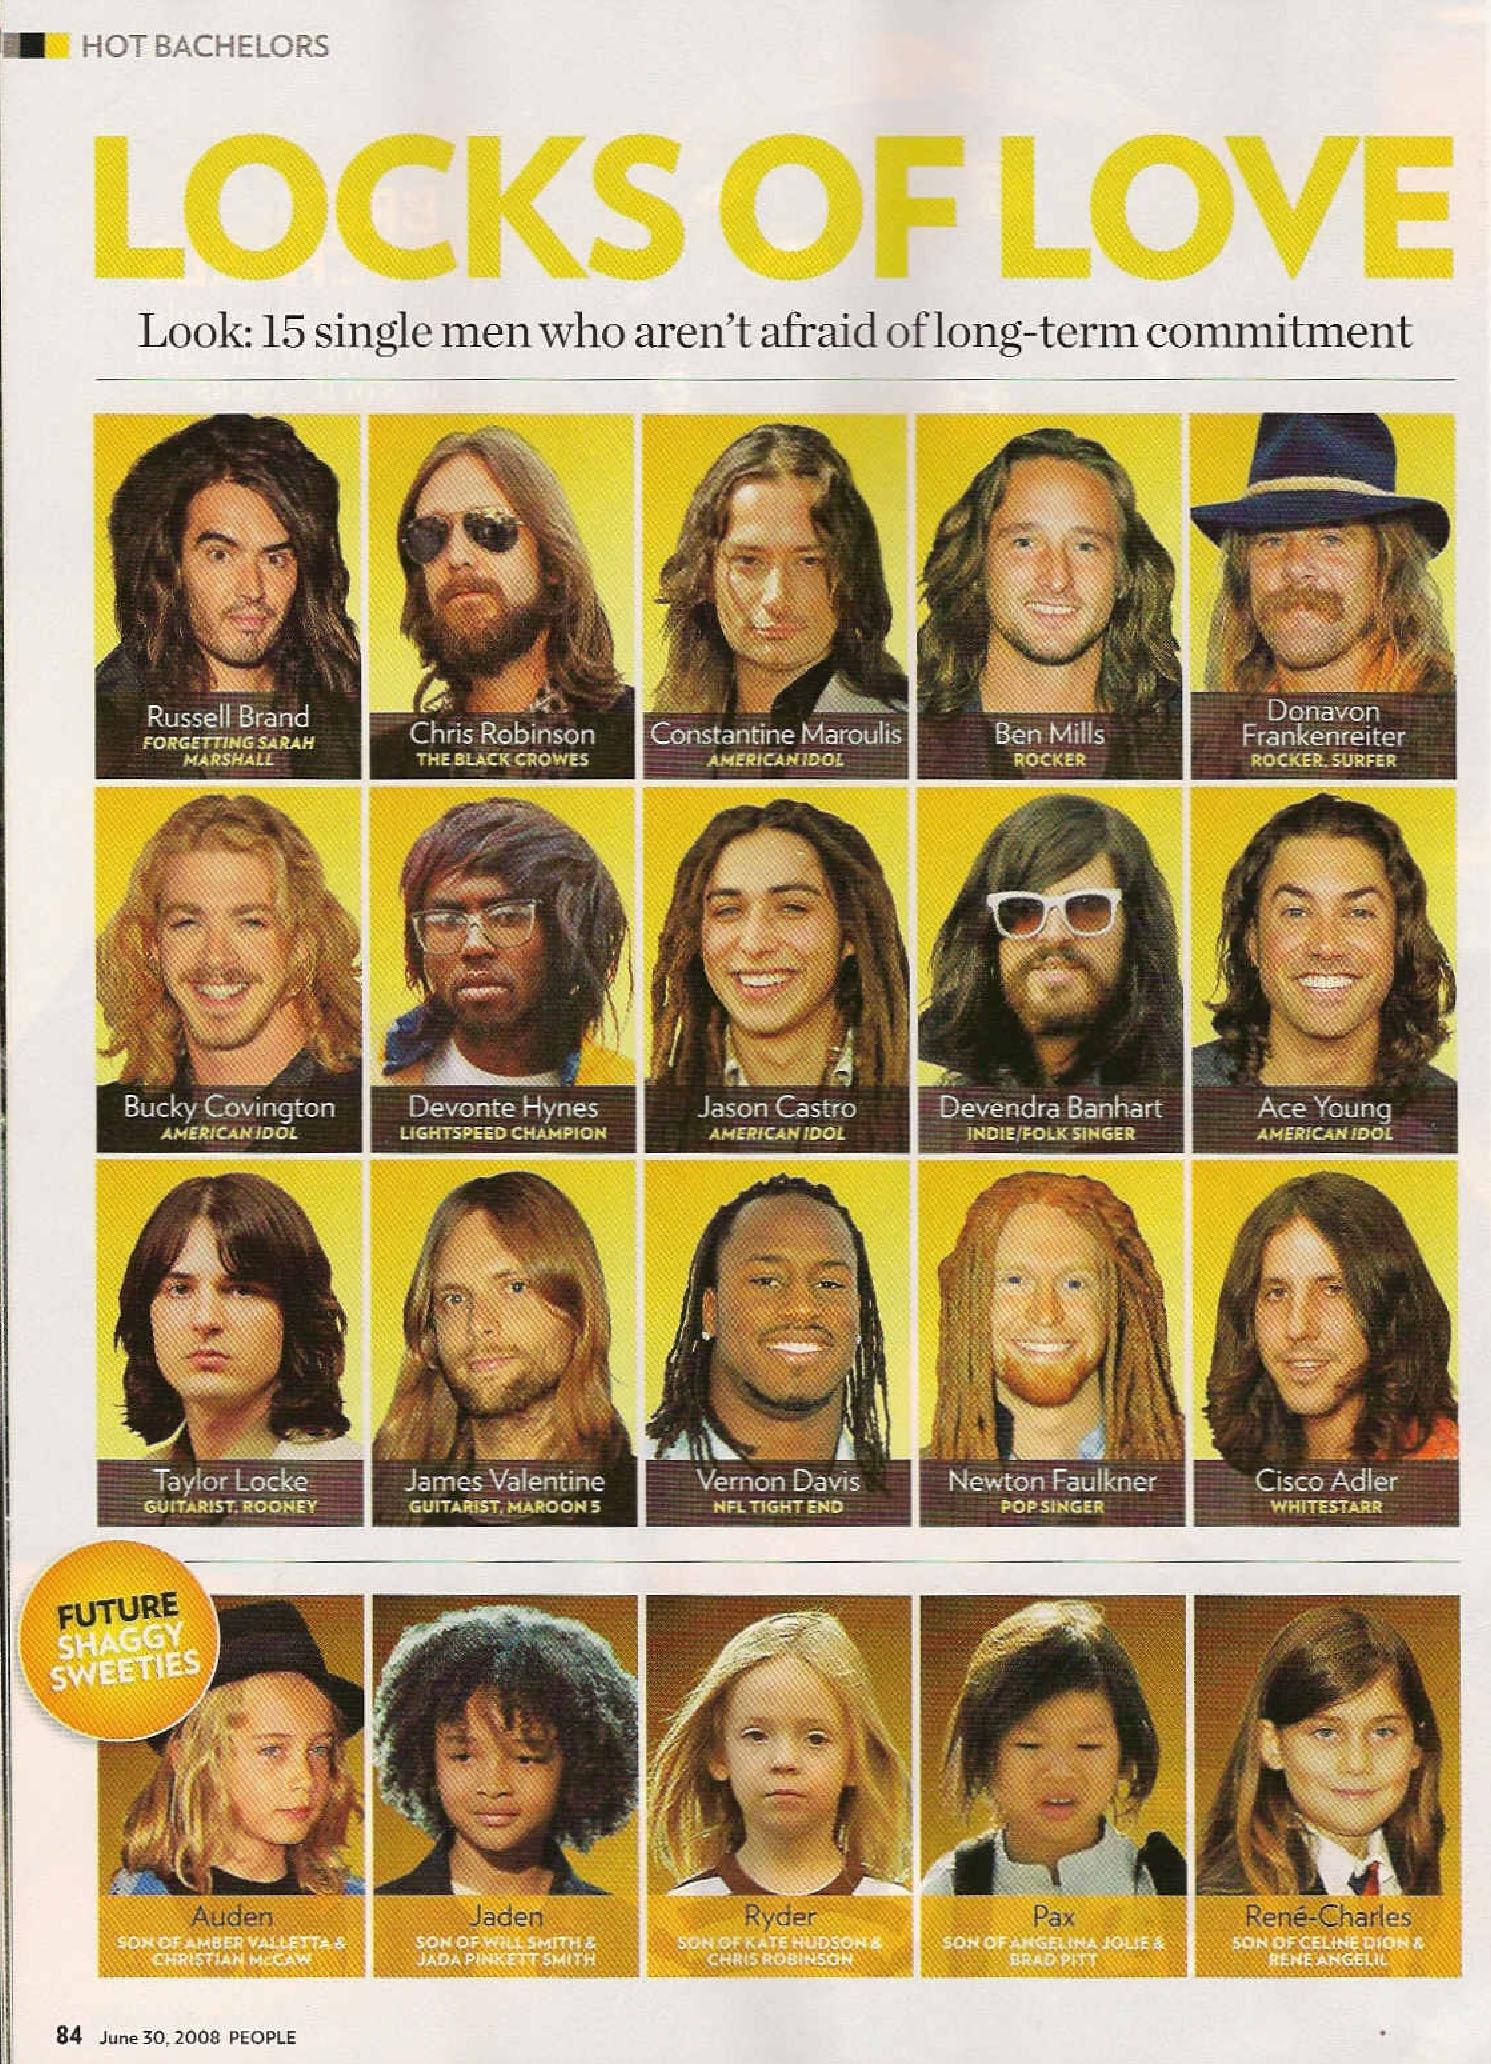 Lock of Love Vernon Davis People Magazine June 30th 2008 issue